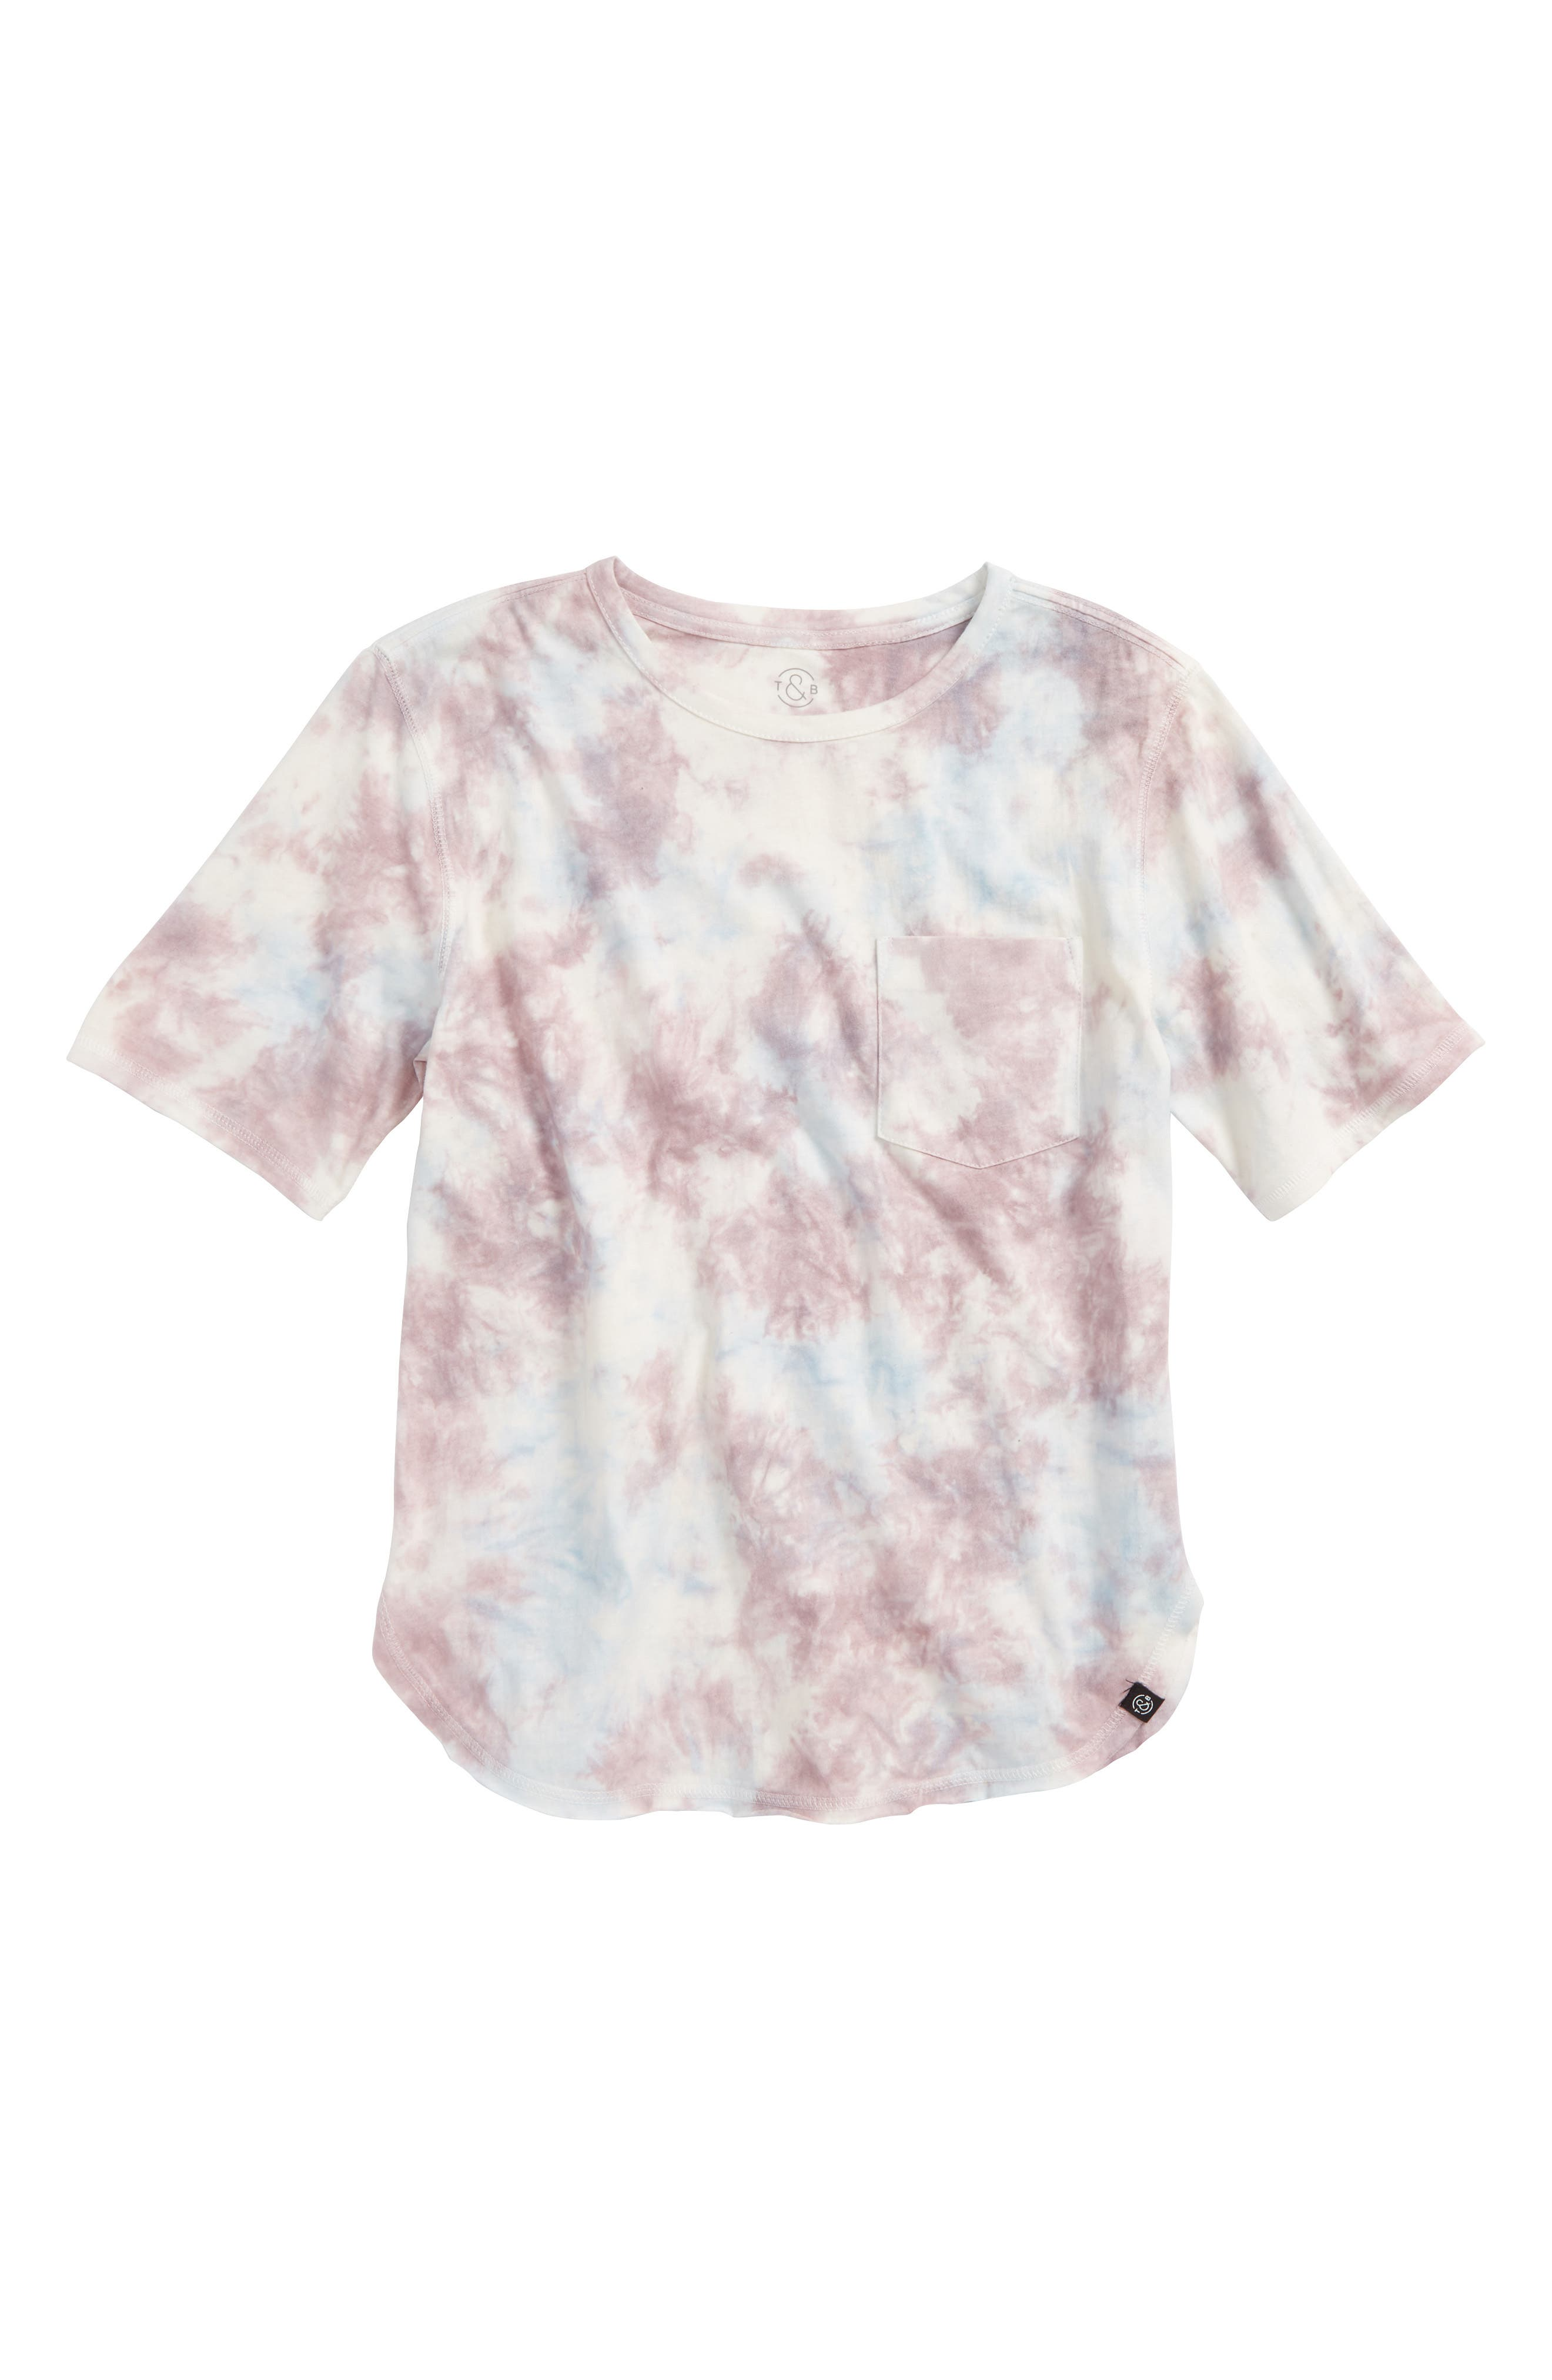 TREASURE & BOND Tie Dye T-Shirt, Main, color, 900